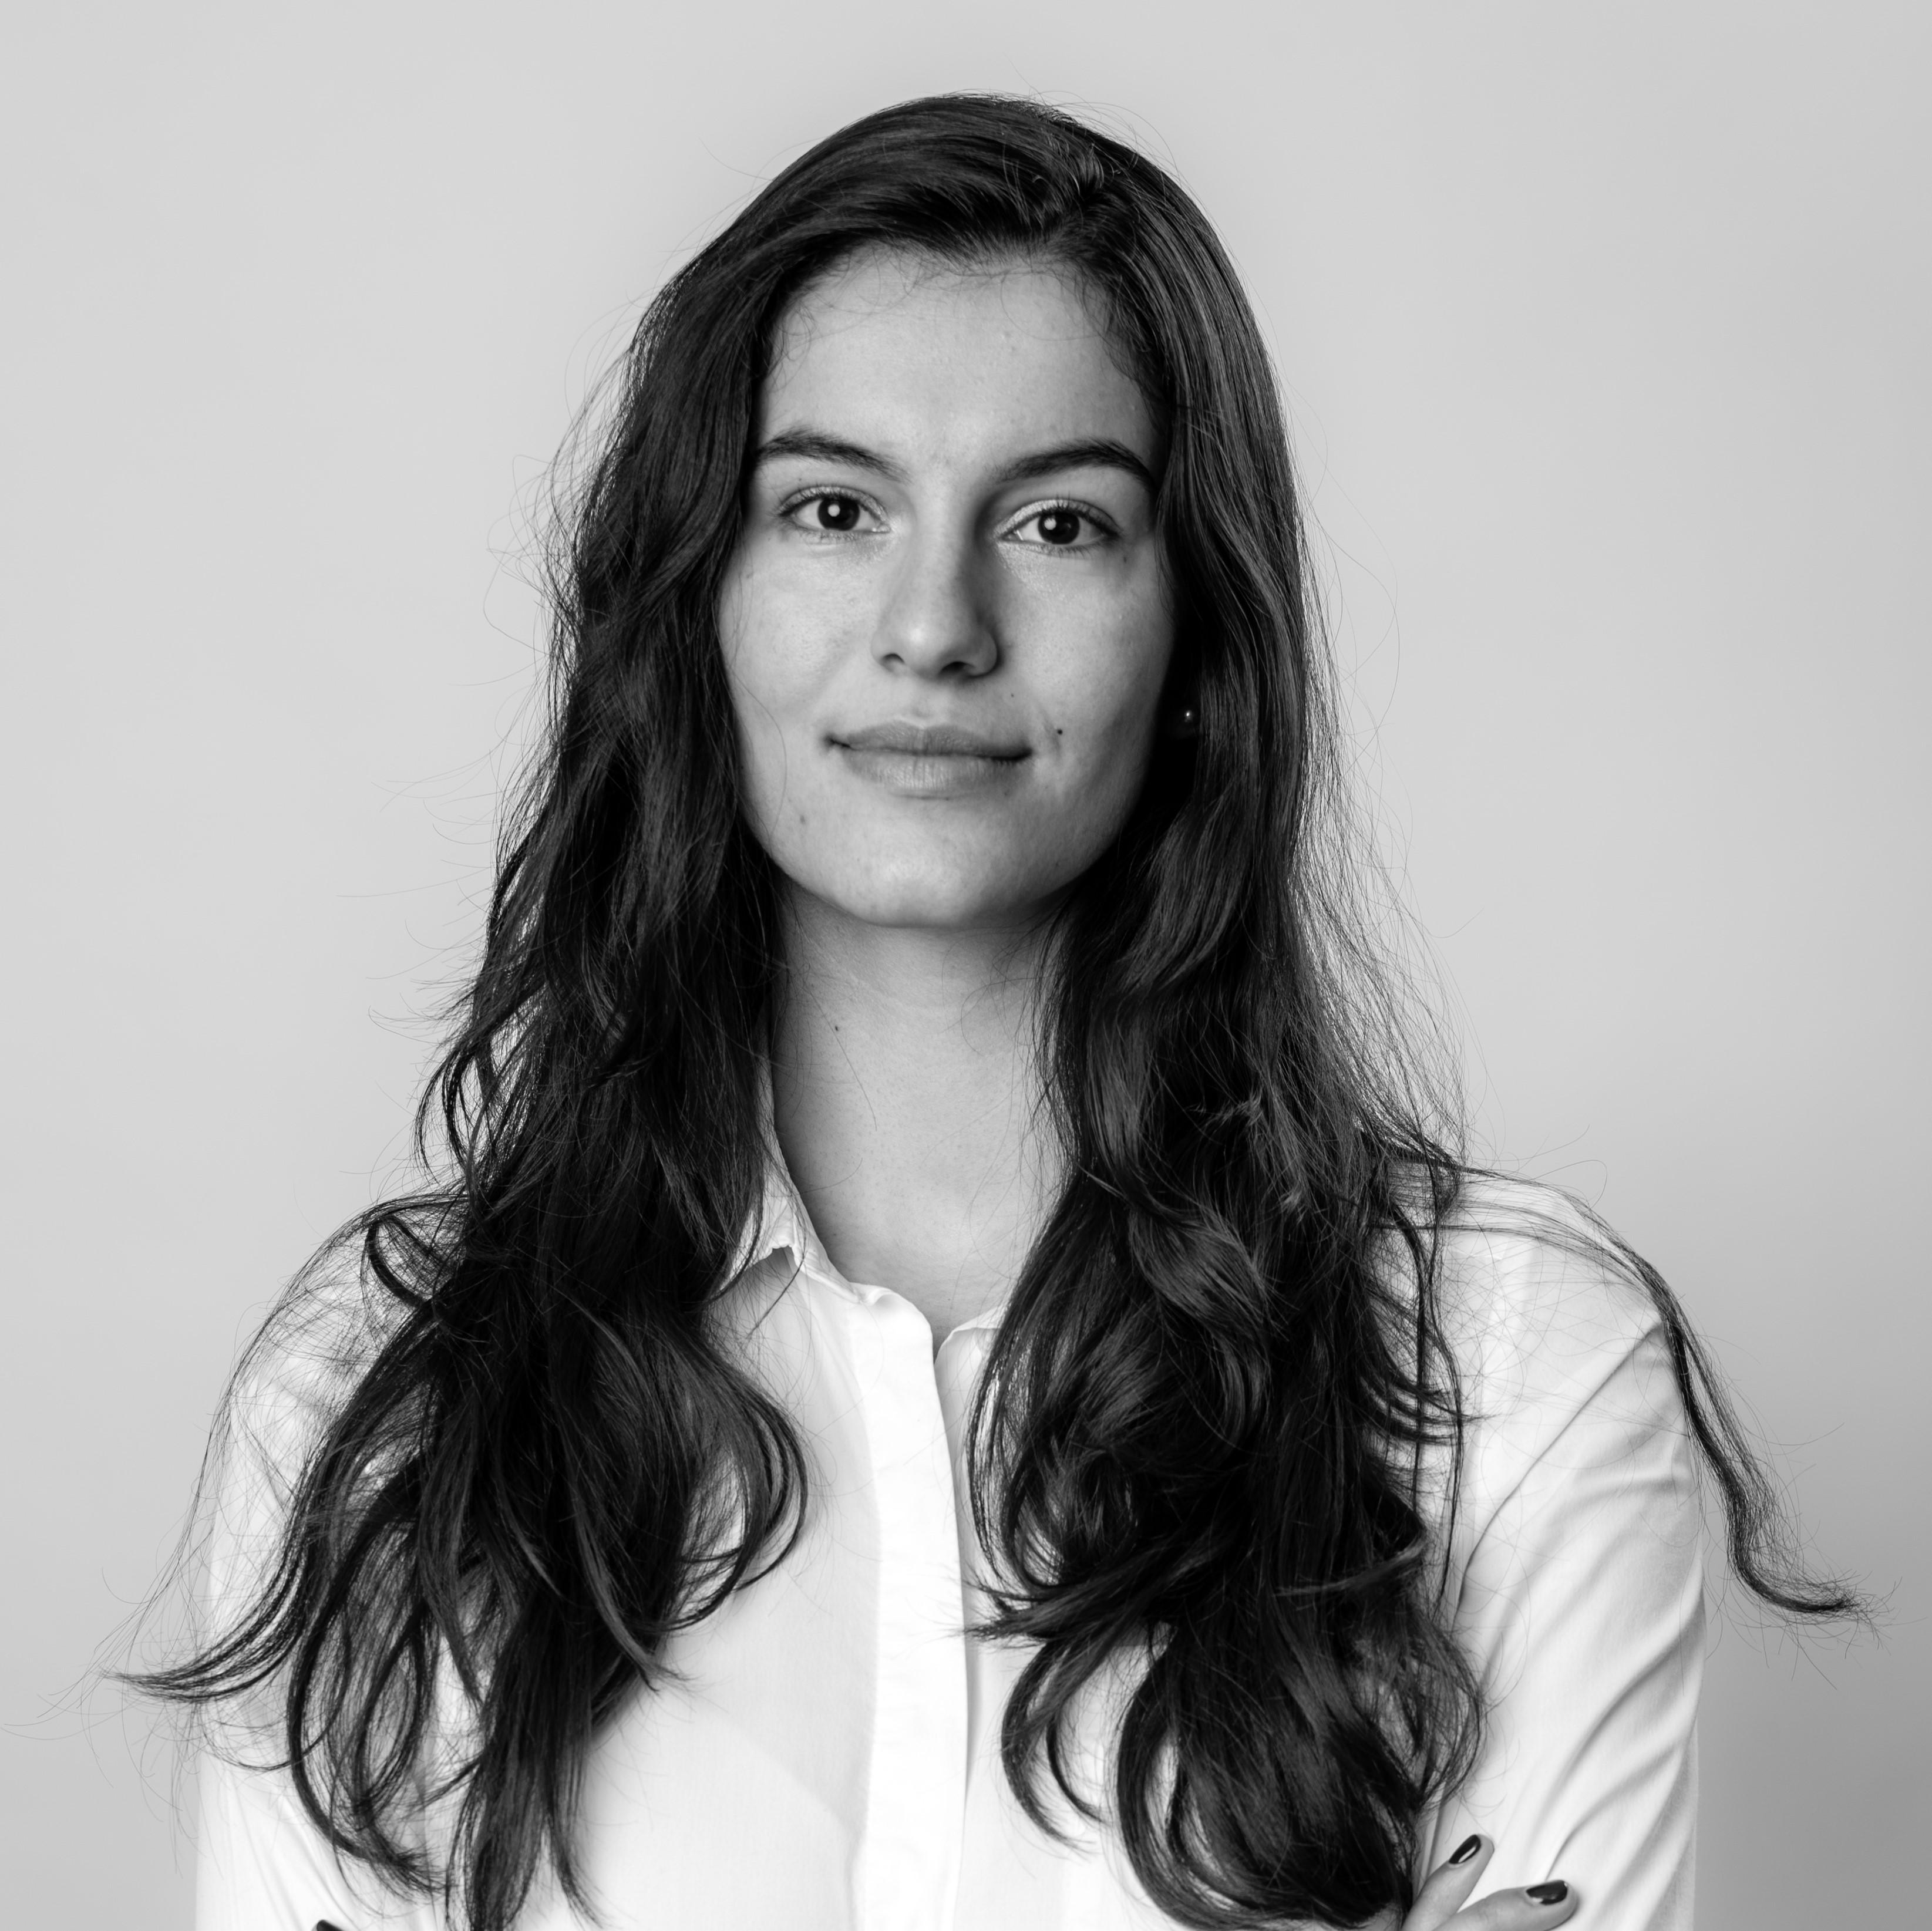 Anna-Maria Maleska